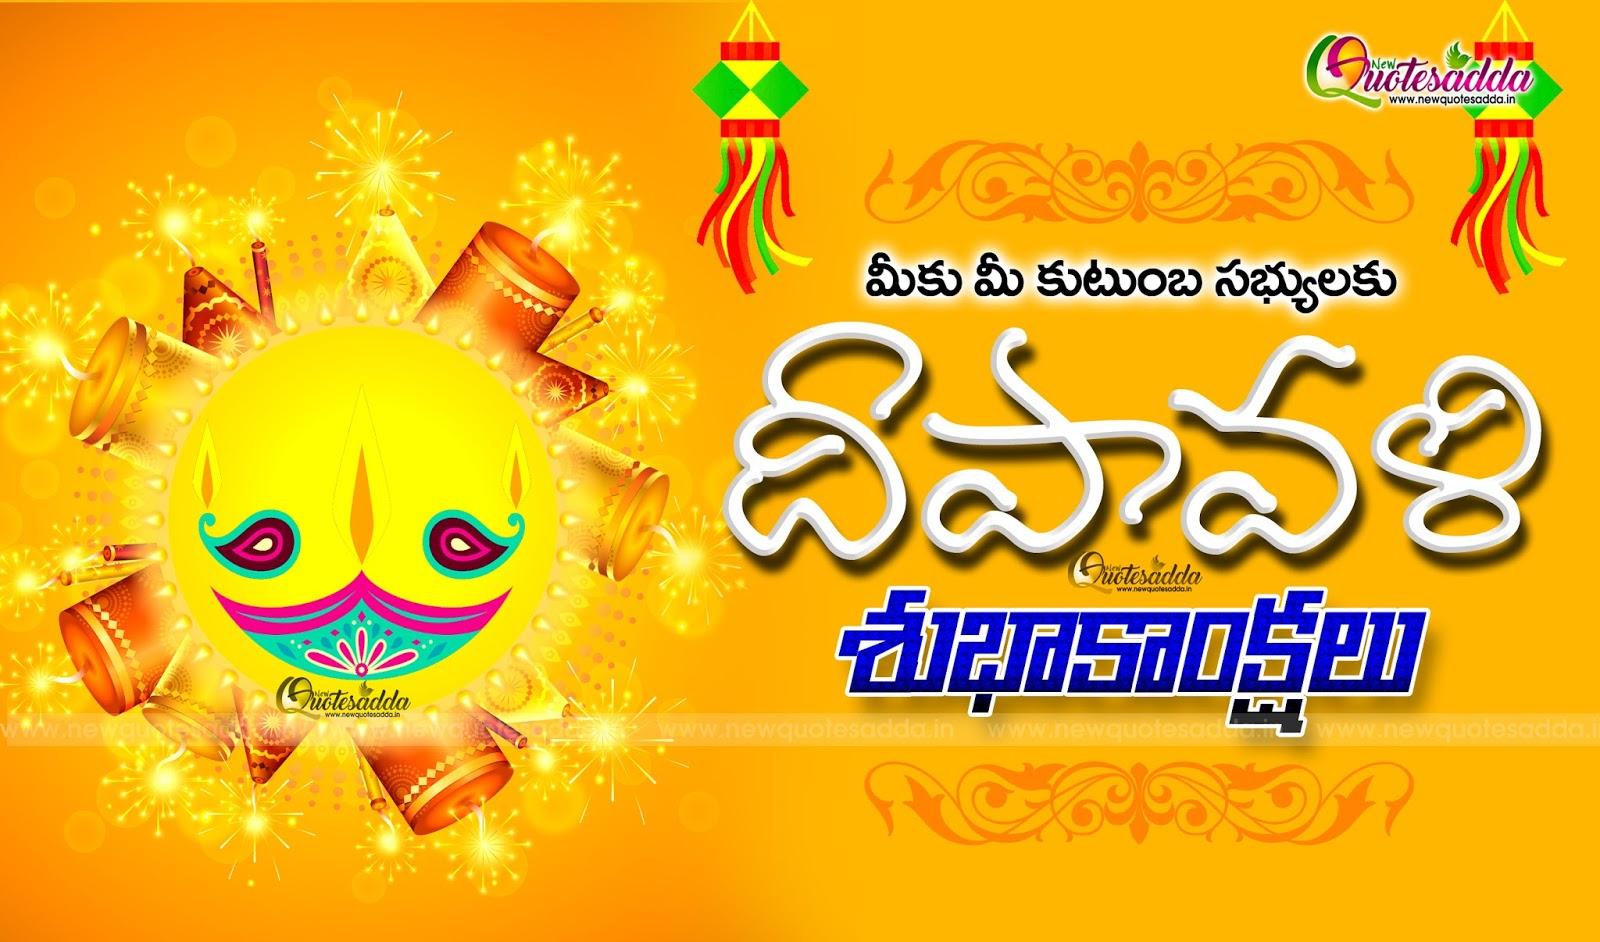 Happy Diwali Wishes In Telugu Quotes And Greetings Newquotesadda